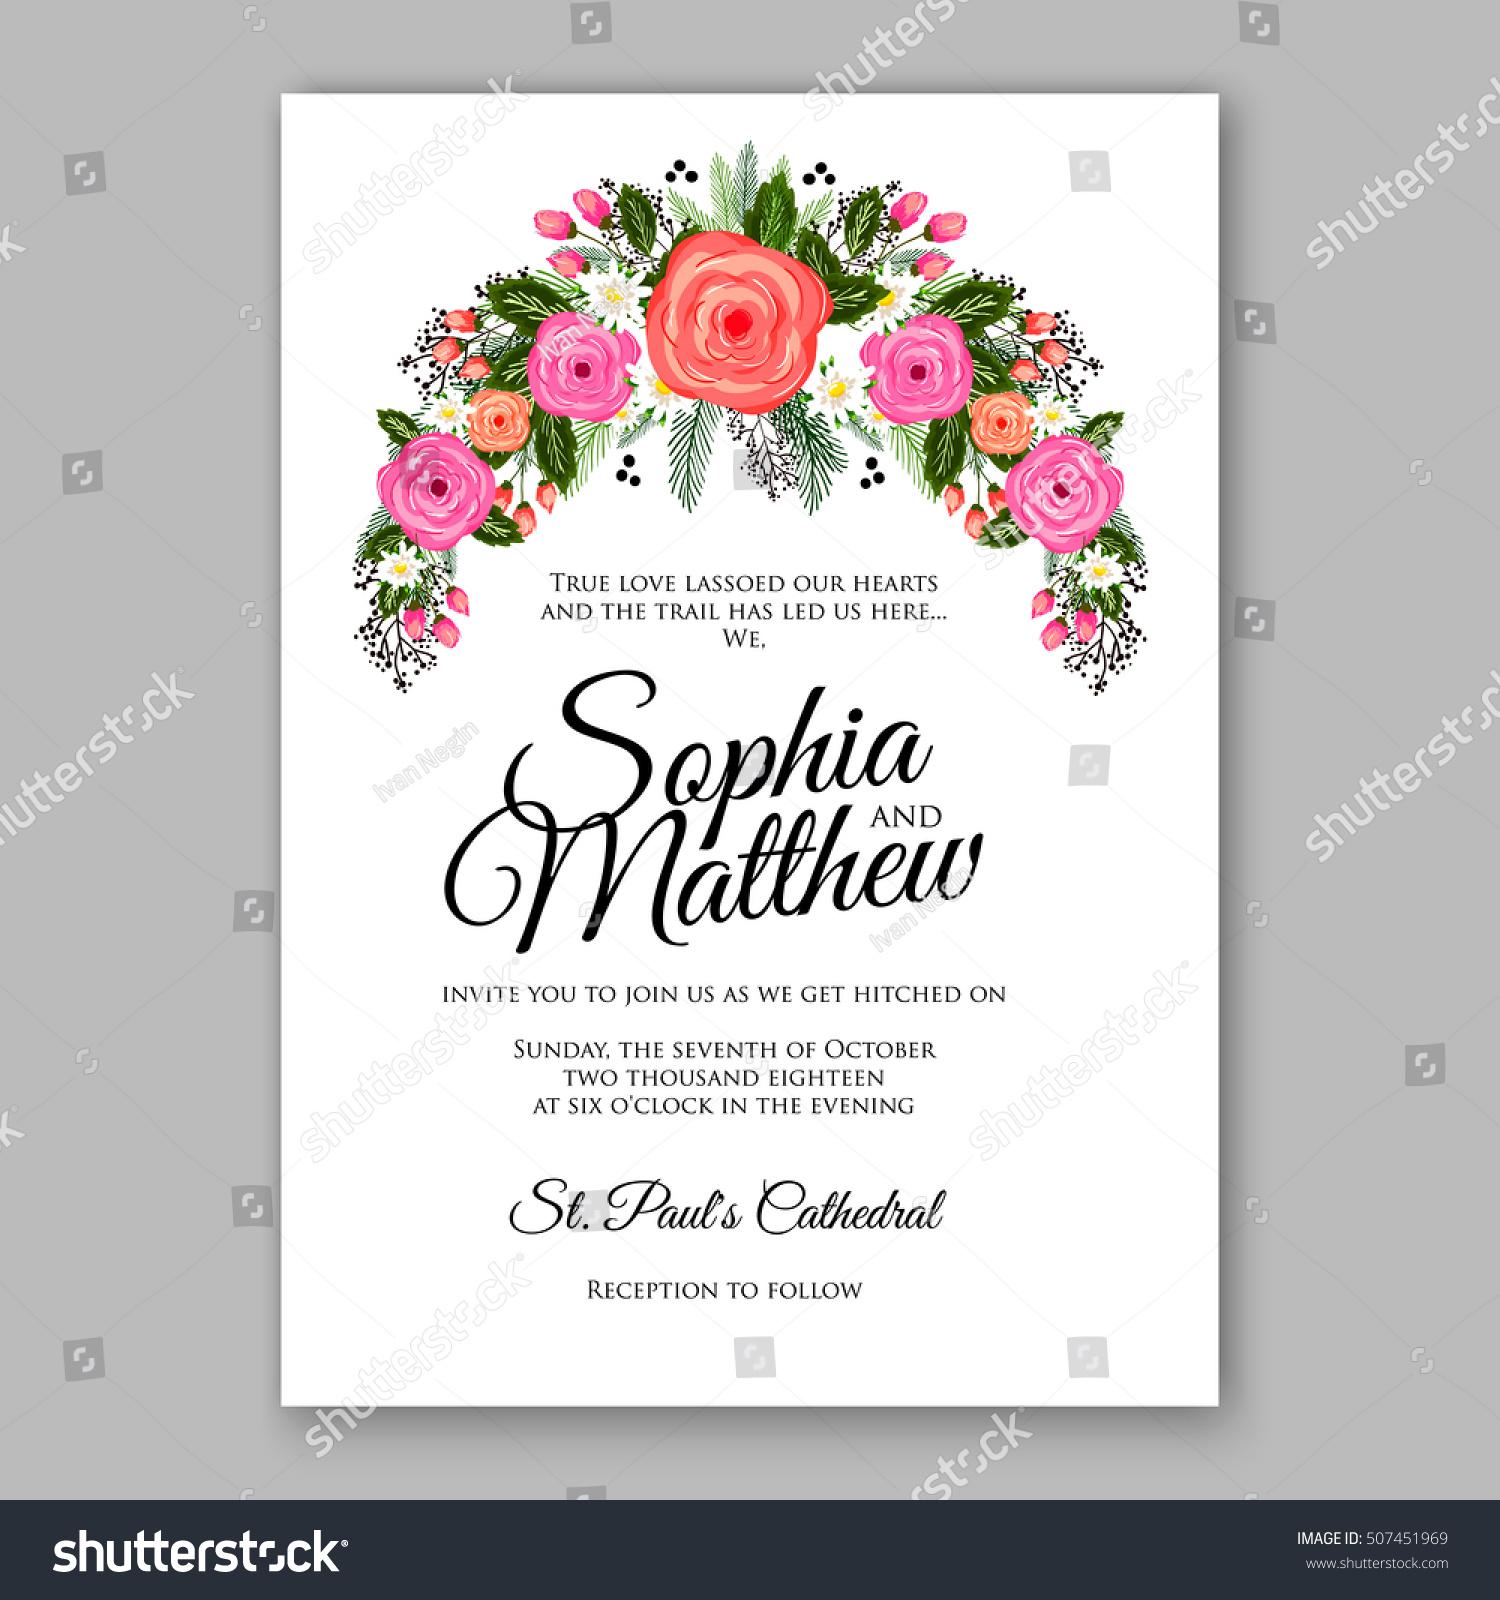 wedding invitation printable template floral wreath stock vector